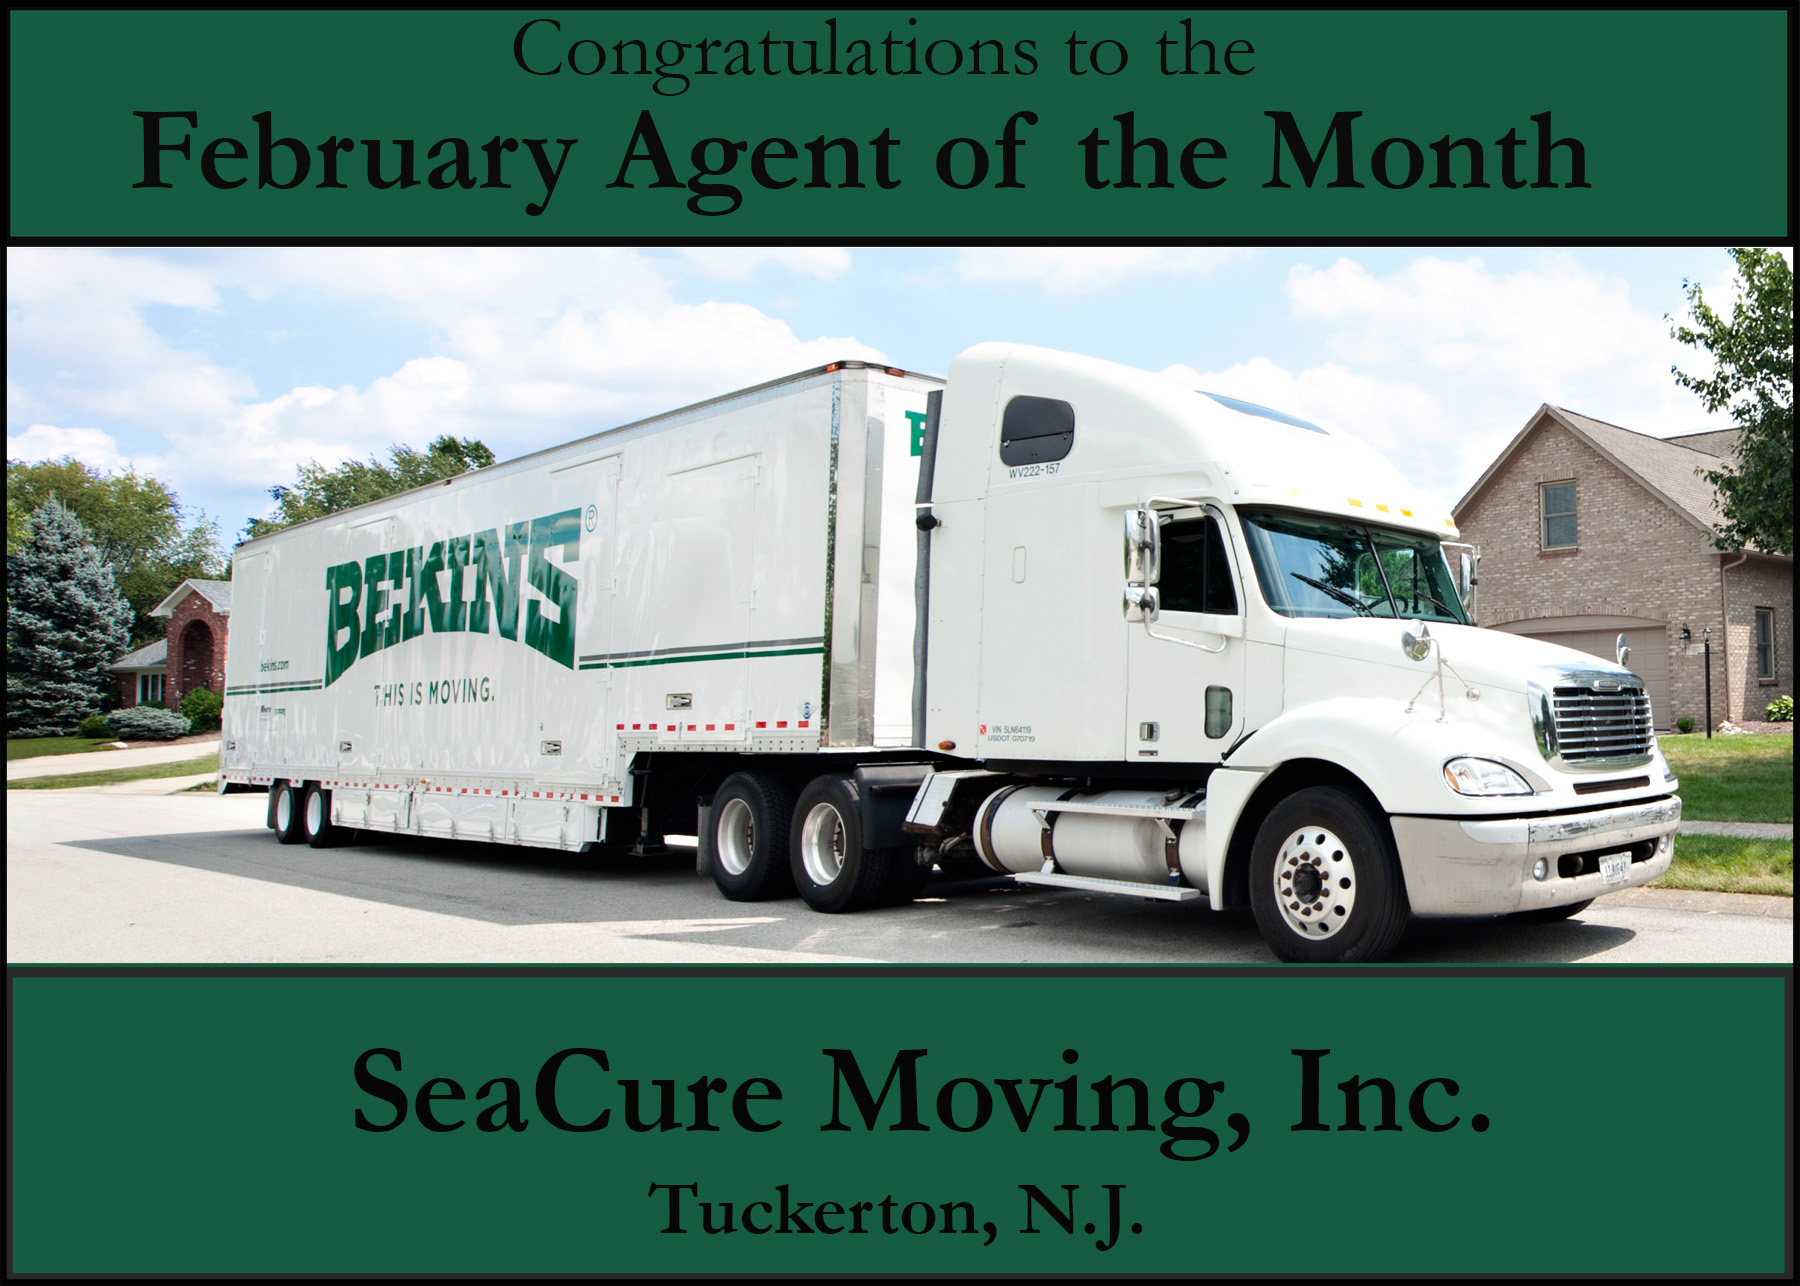 February 2016 - SeaCure Moving